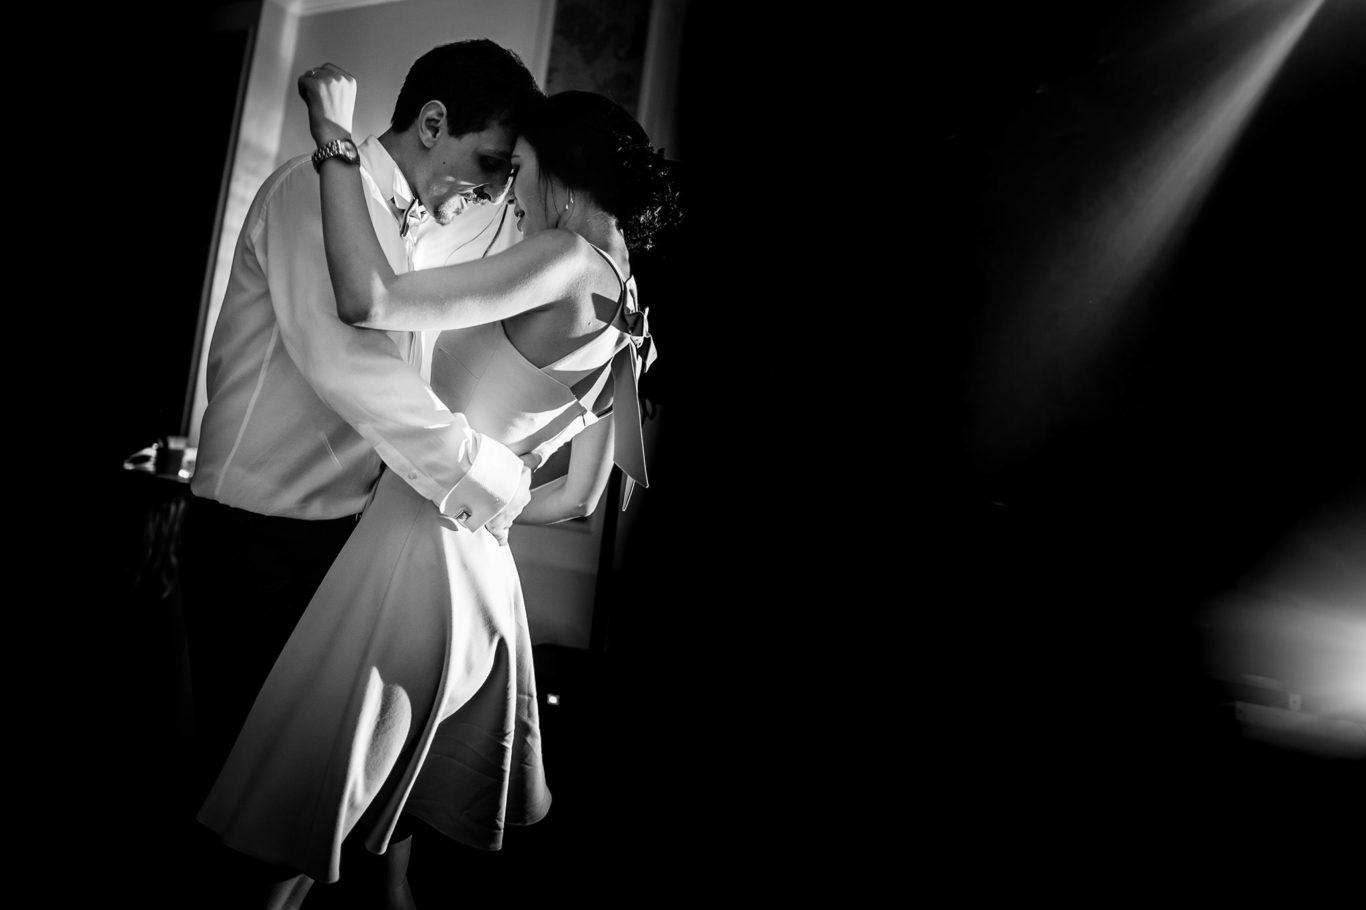 0611-fotografie-nunta-bucuresti-cristina-nicusor-fotograf-ciprian-dumitrescu-dc1_0186-2